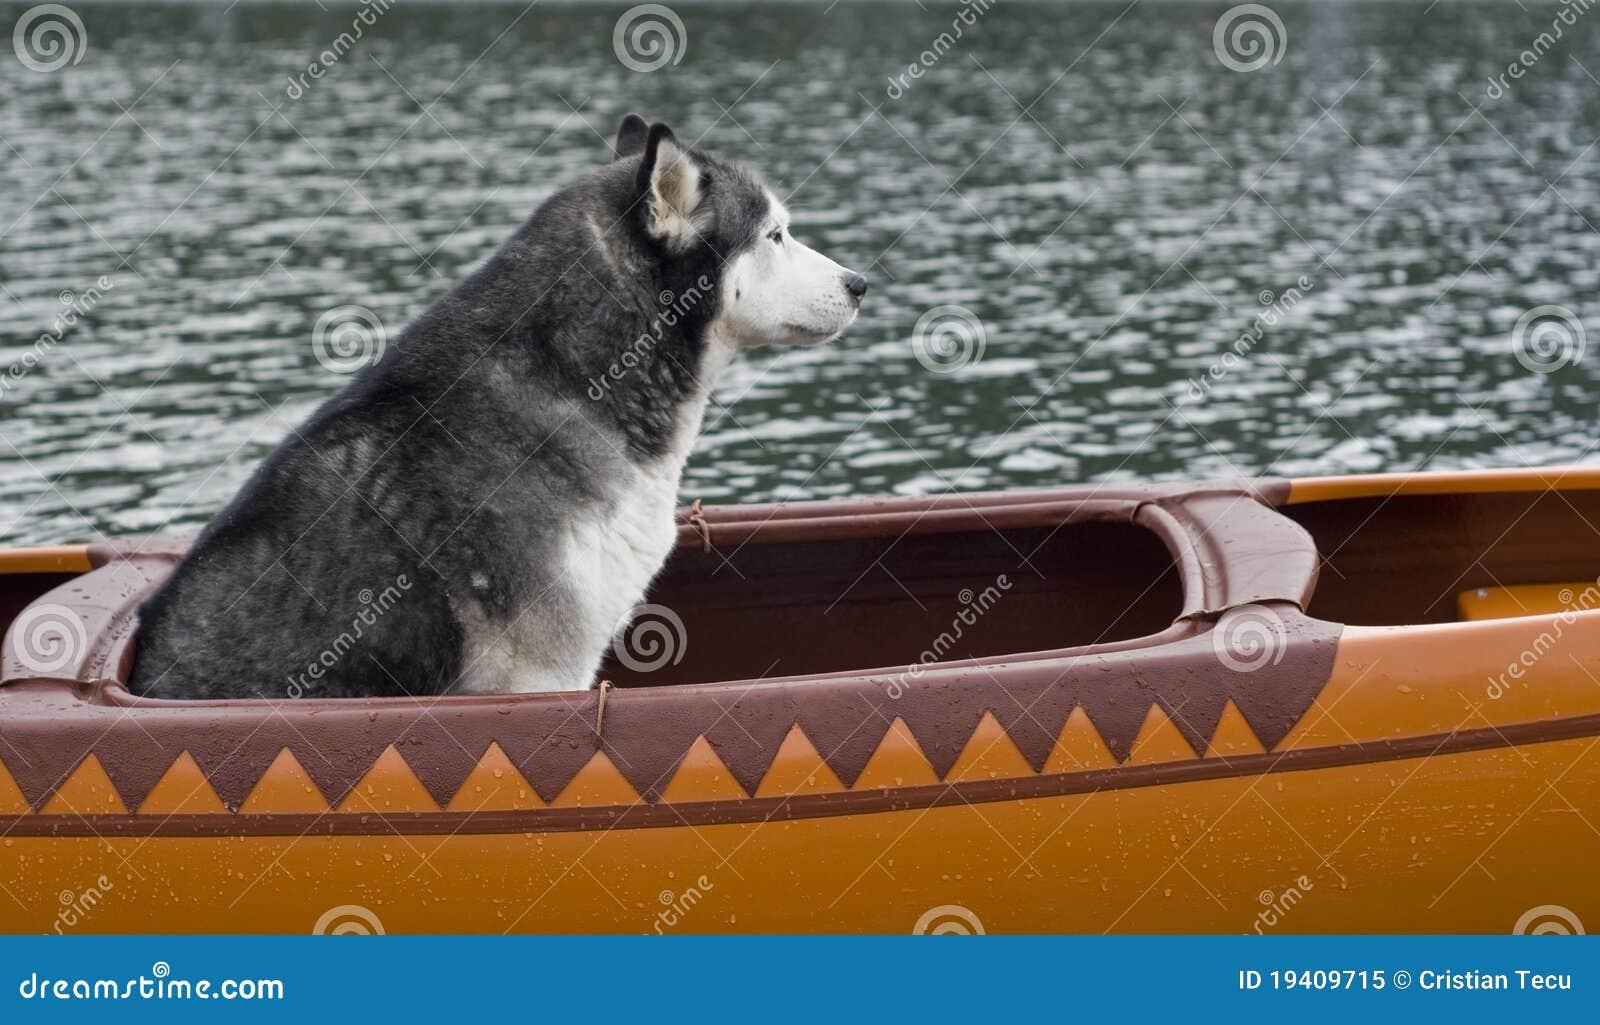 Husky lexa